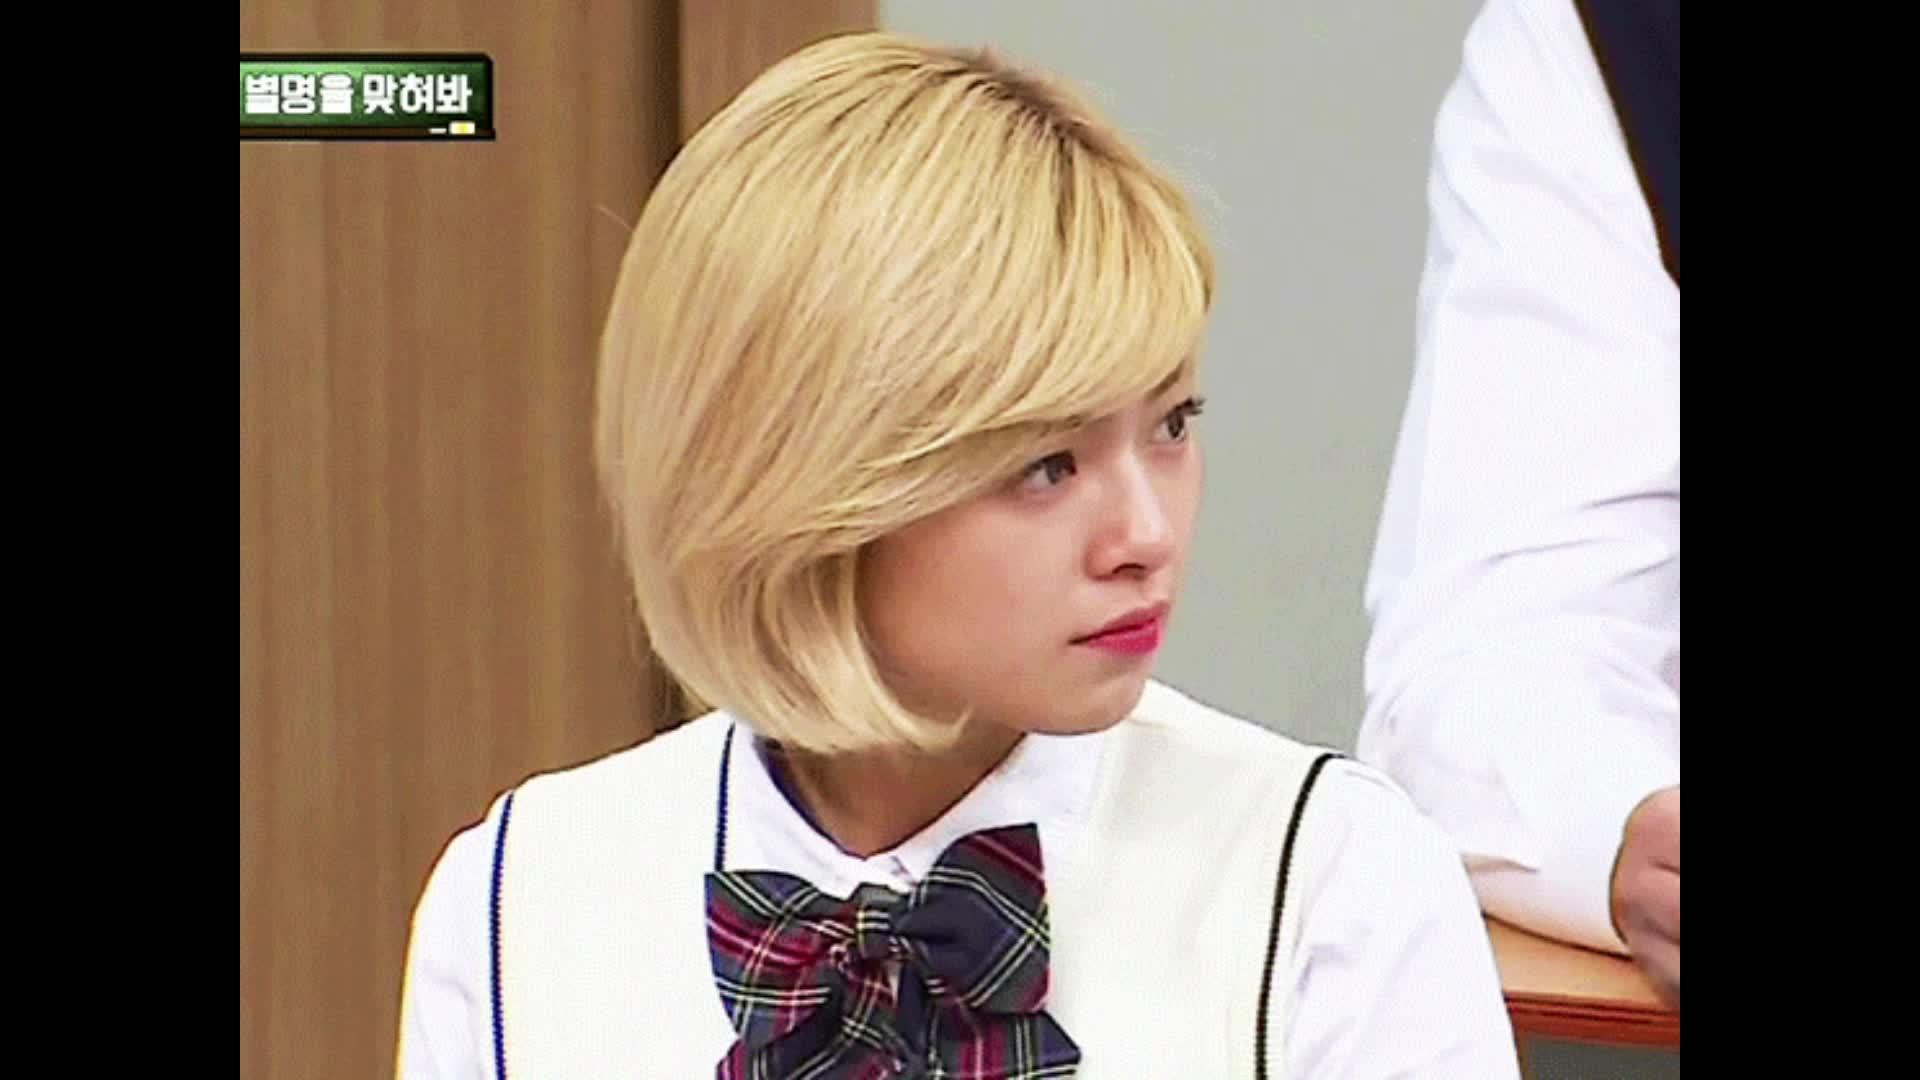 celebs, jeongyeon, kpop, twice, jeongyeon GIFs